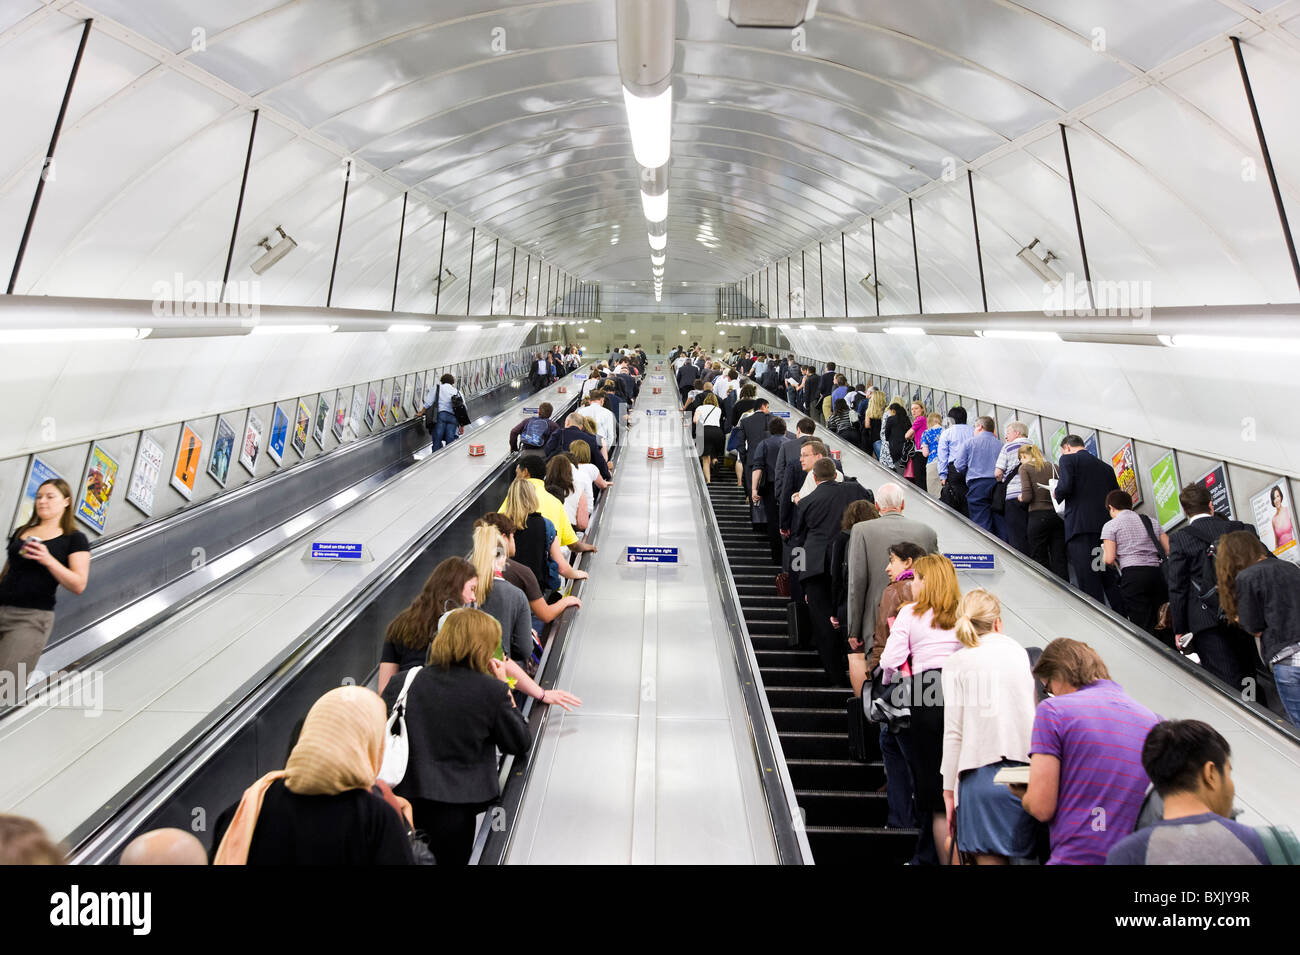 Die Londoner U-Bahn Fahrtreppen am Holborn Station während der Rush Hour, England, Großbritannien Stockbild